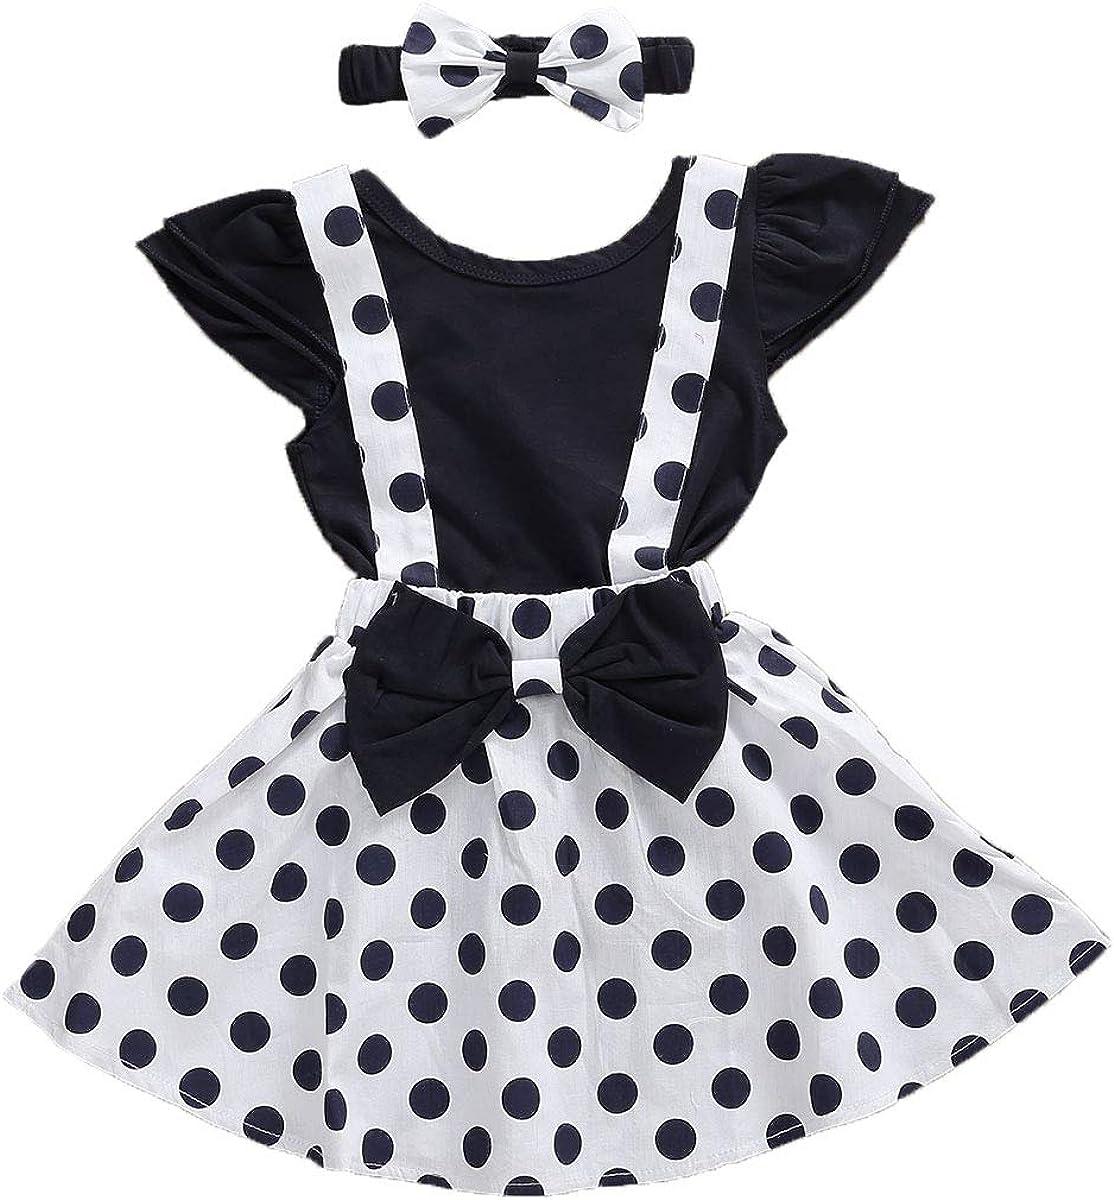 Baby Girls Skirts Set Ruffle Romper Tops + Printing Polka Dot Suspender Skirt + Bow Knot Headband 3Pcs Clothes Set